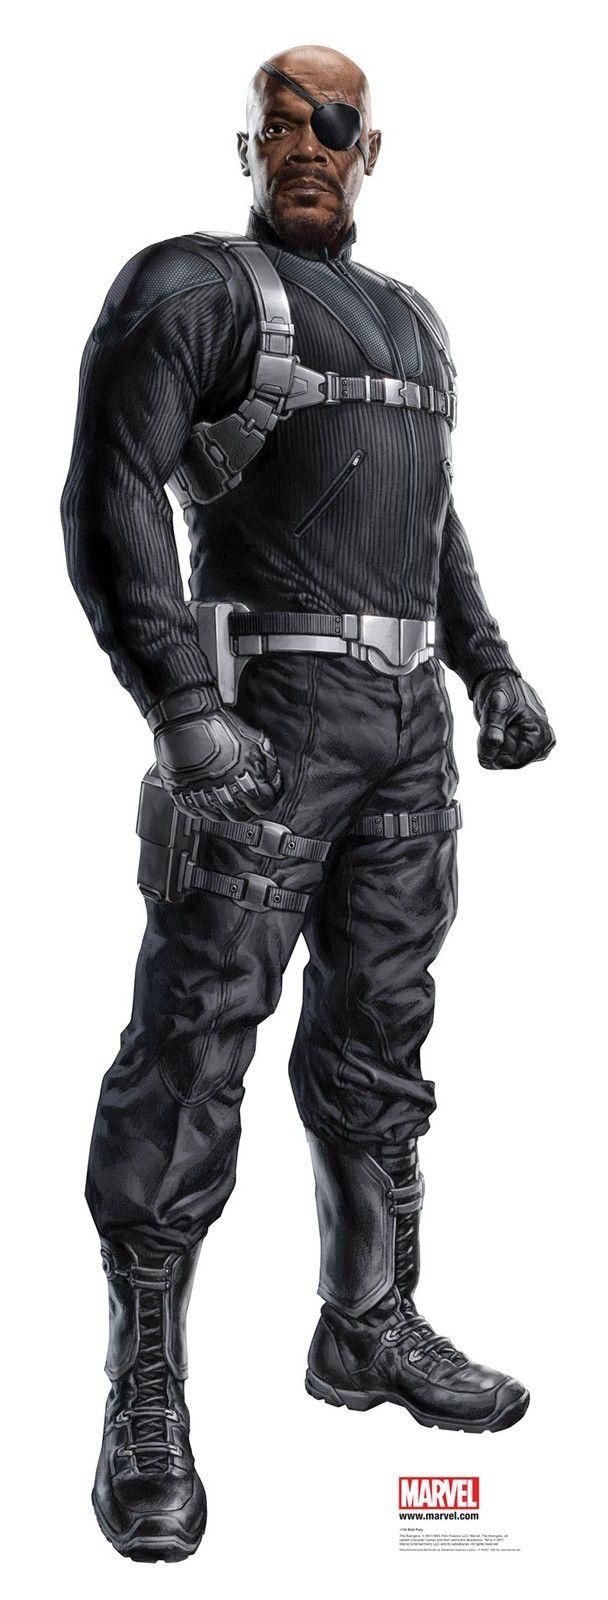 Los Vengadores: Nick Furia / The Avengers: Nick Fury